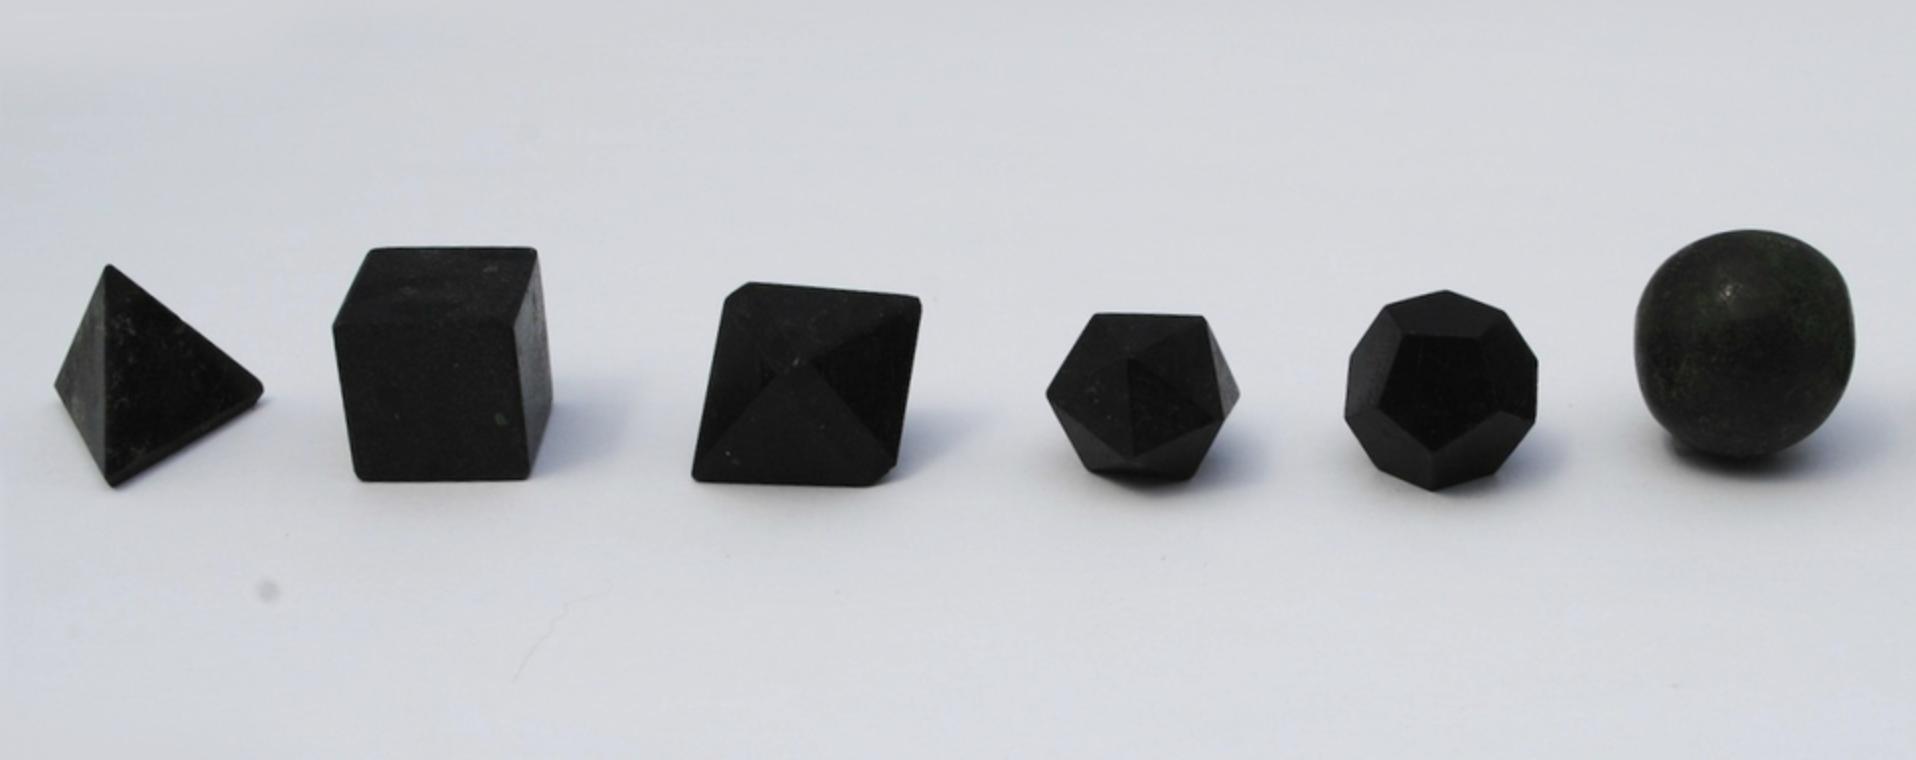 Black_stones.png